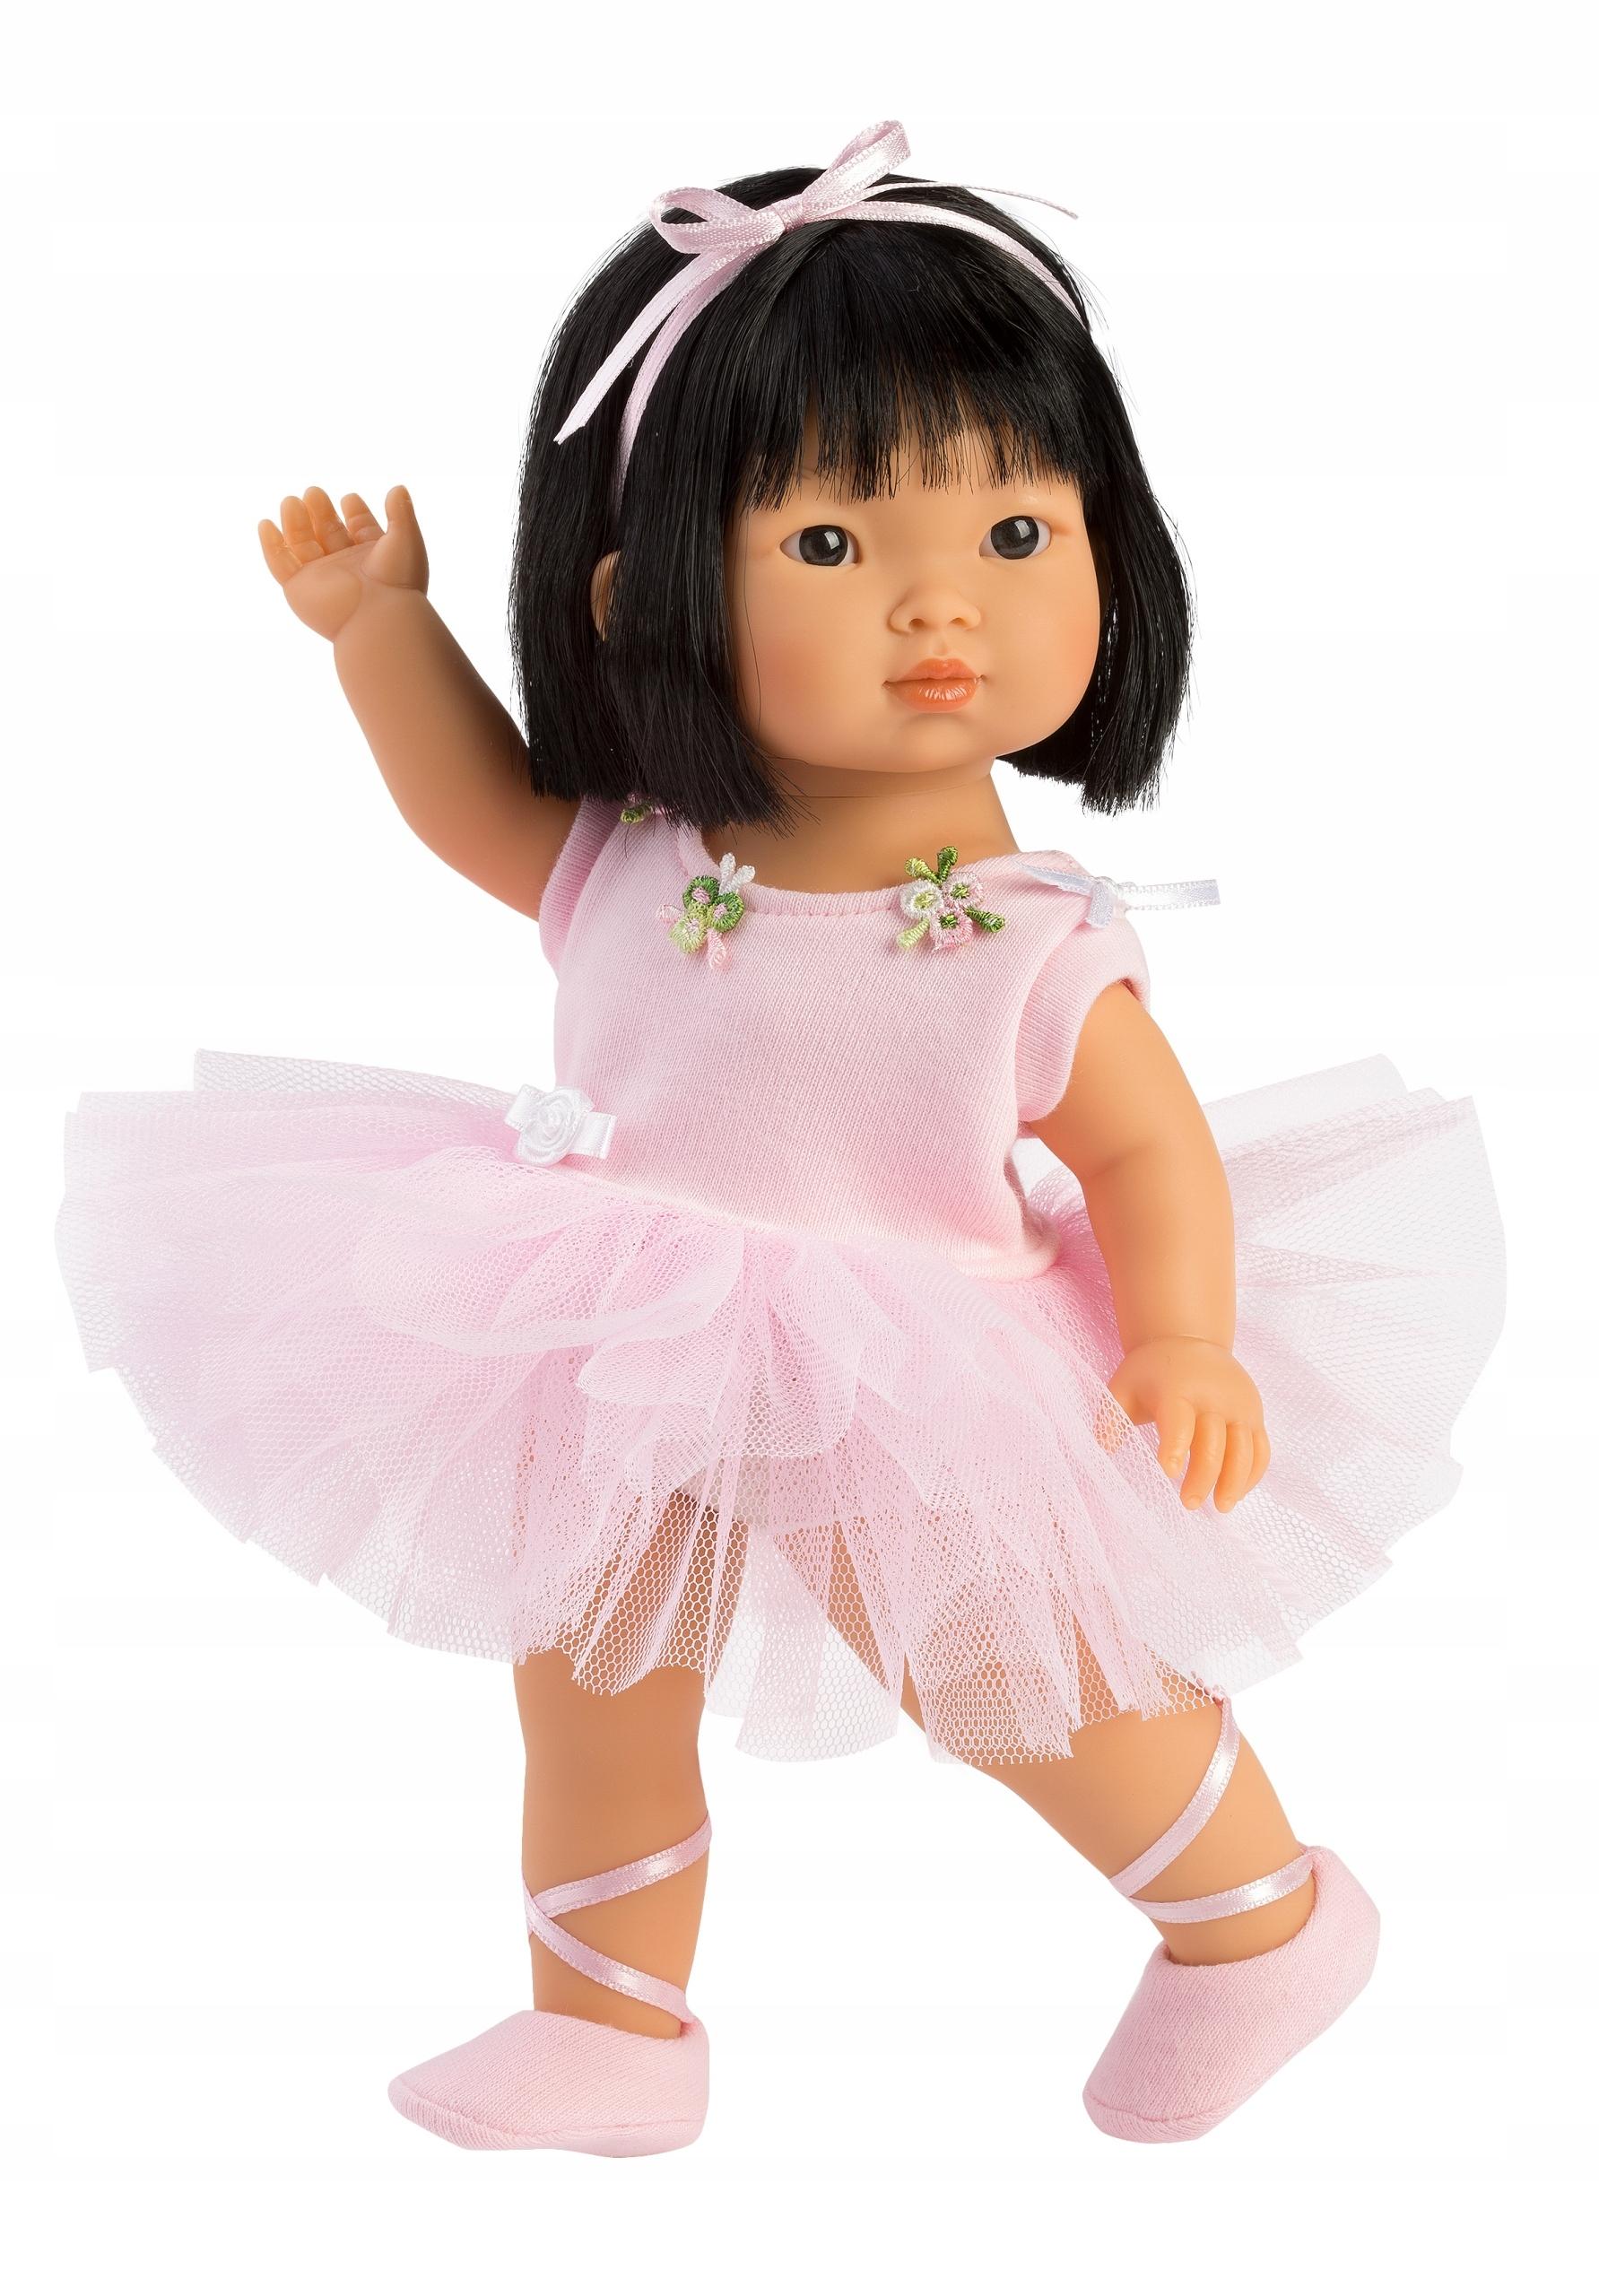 Španielska bábika Llorens Lu s kvetinami